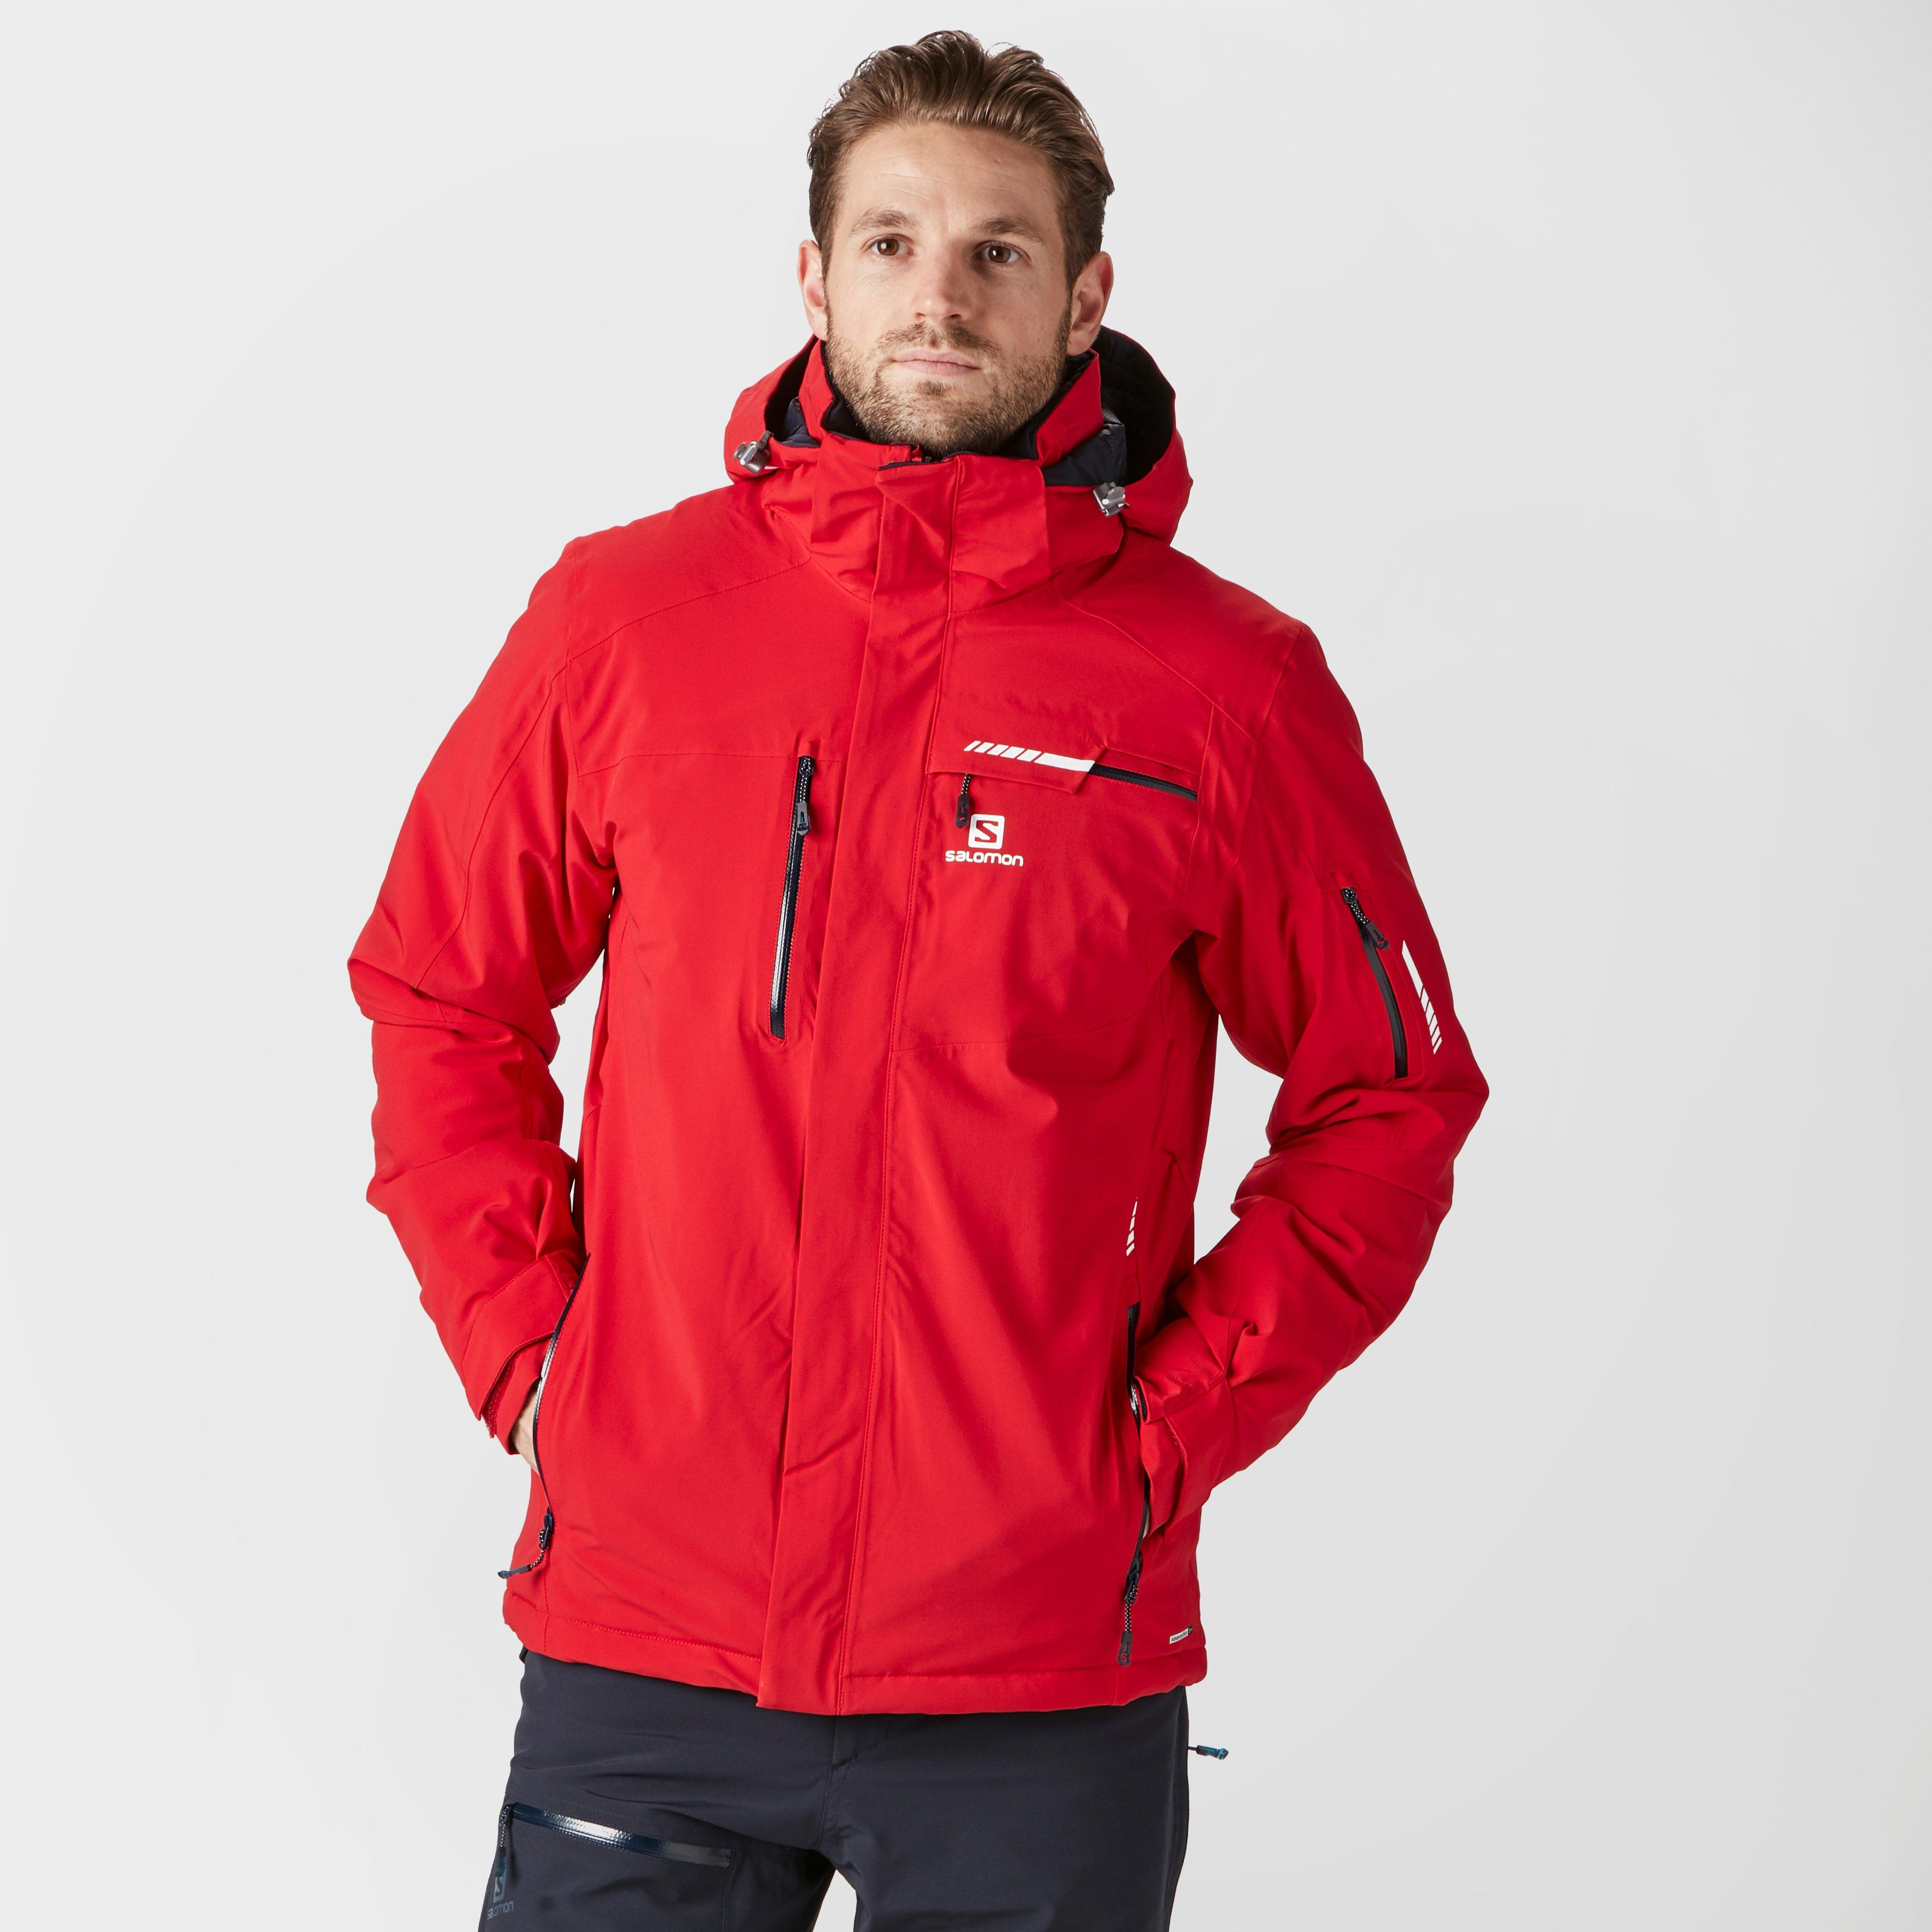 Salomon brilliant ski jacket review